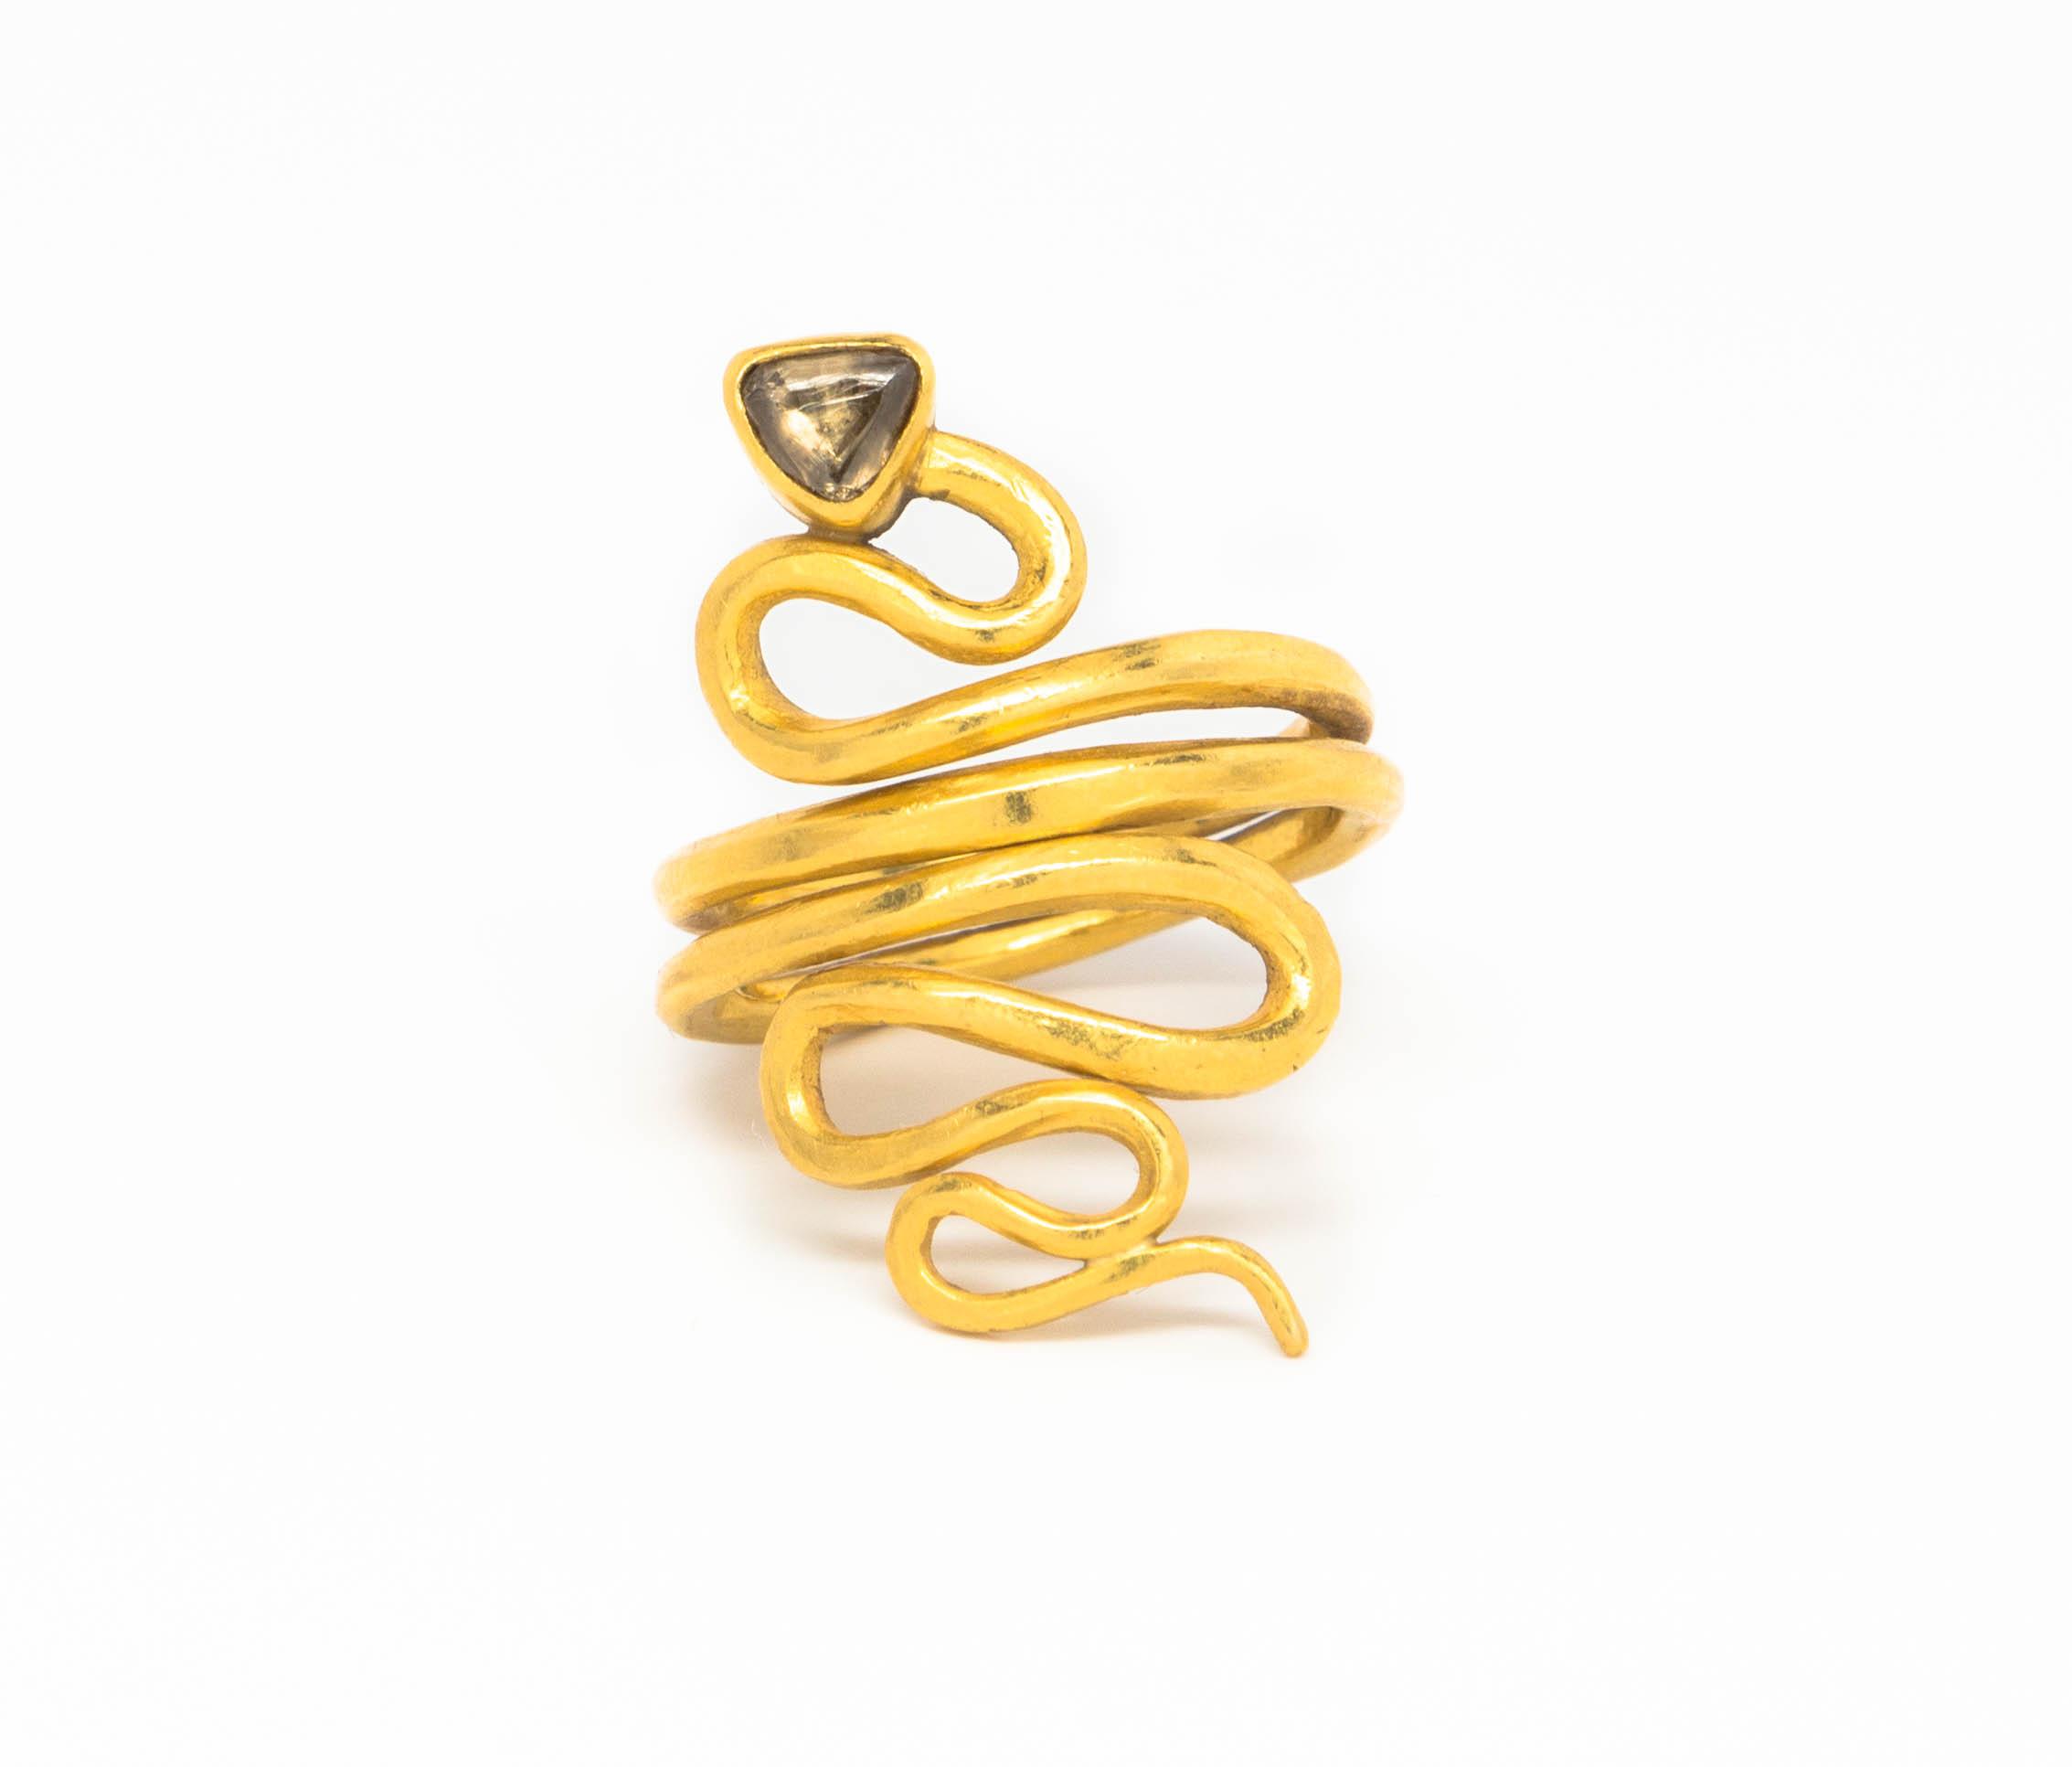 dec21 jewelry5-612.jpg